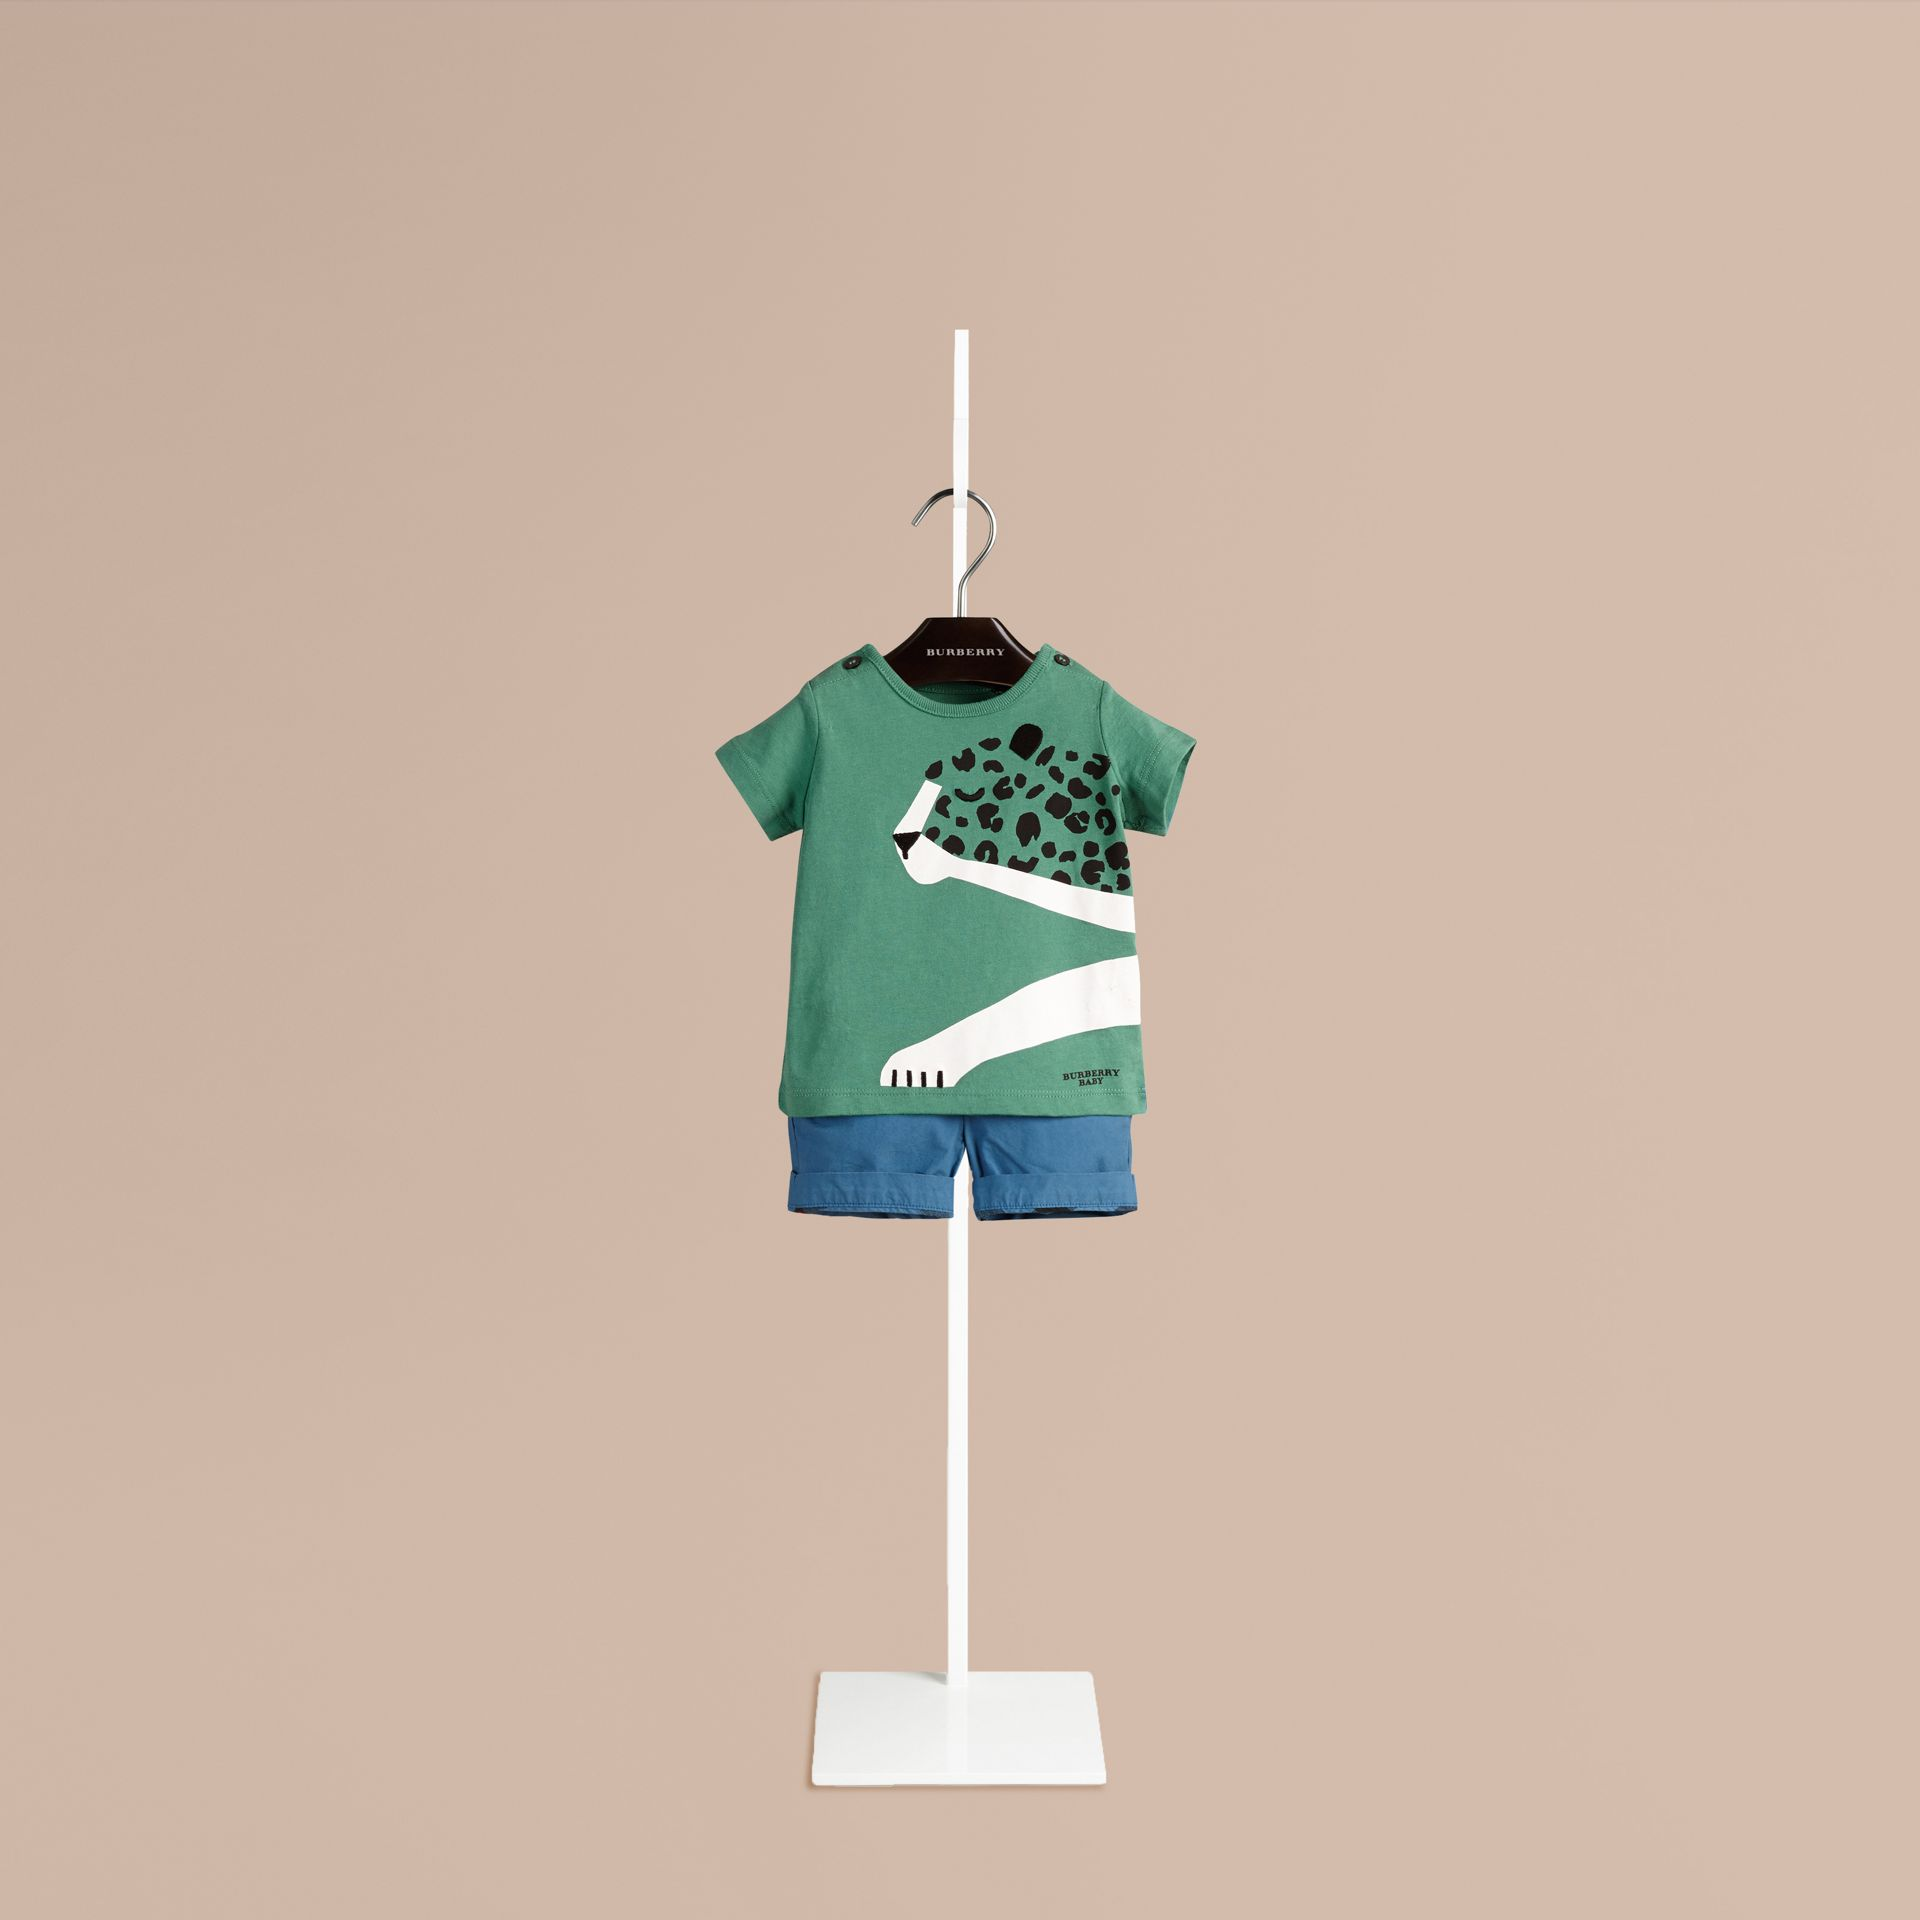 Sturmgrün Baumwoll-T-Shirt mit Gepardmotiv Sturmgrün - Galerie-Bild 1